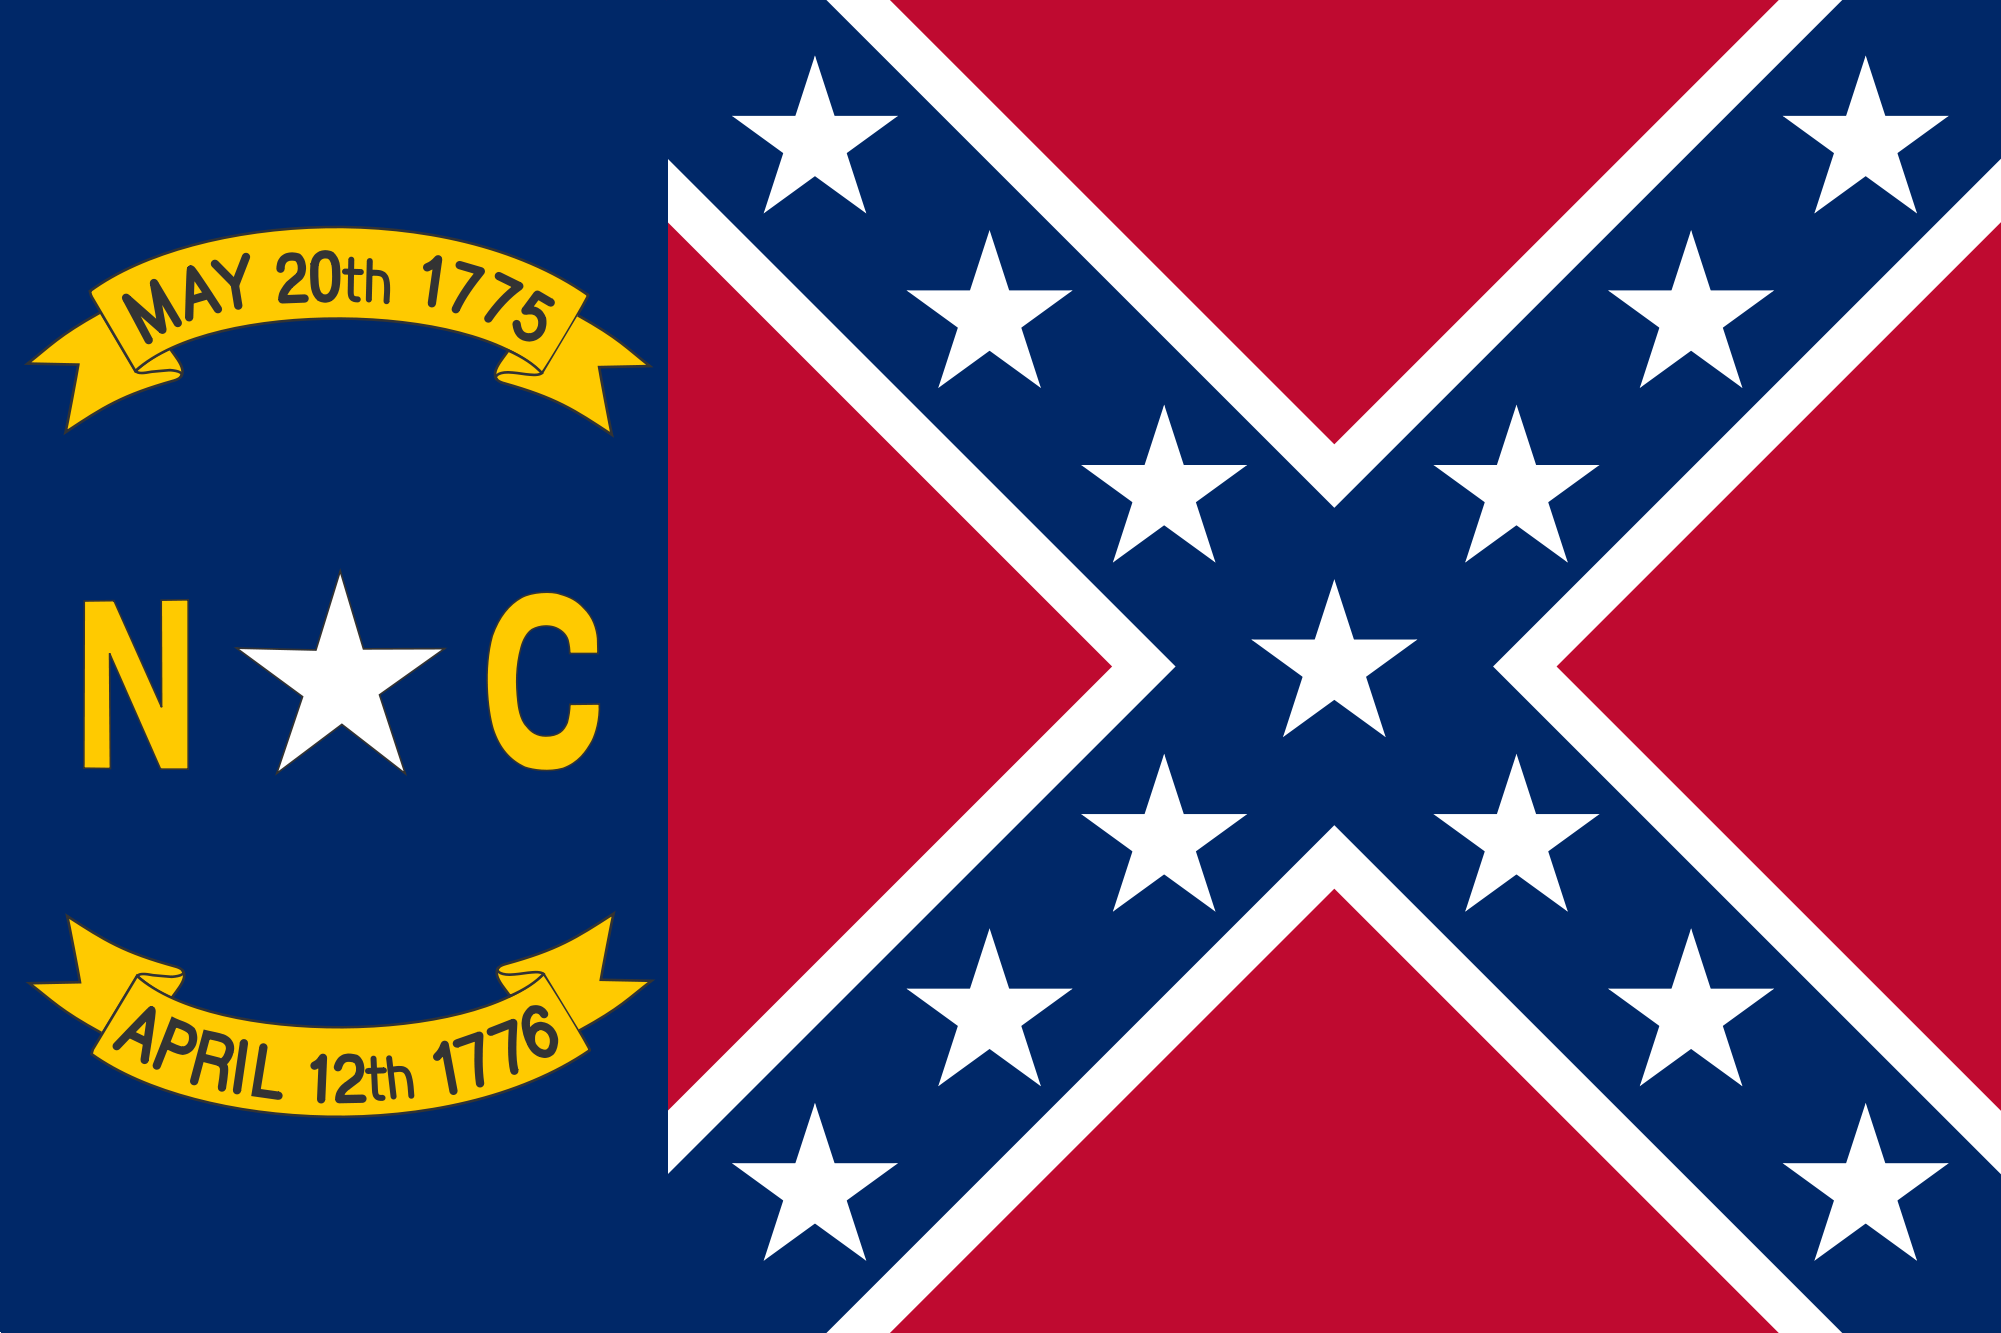 North Carolina Civil War Flag North Carolina State Flag